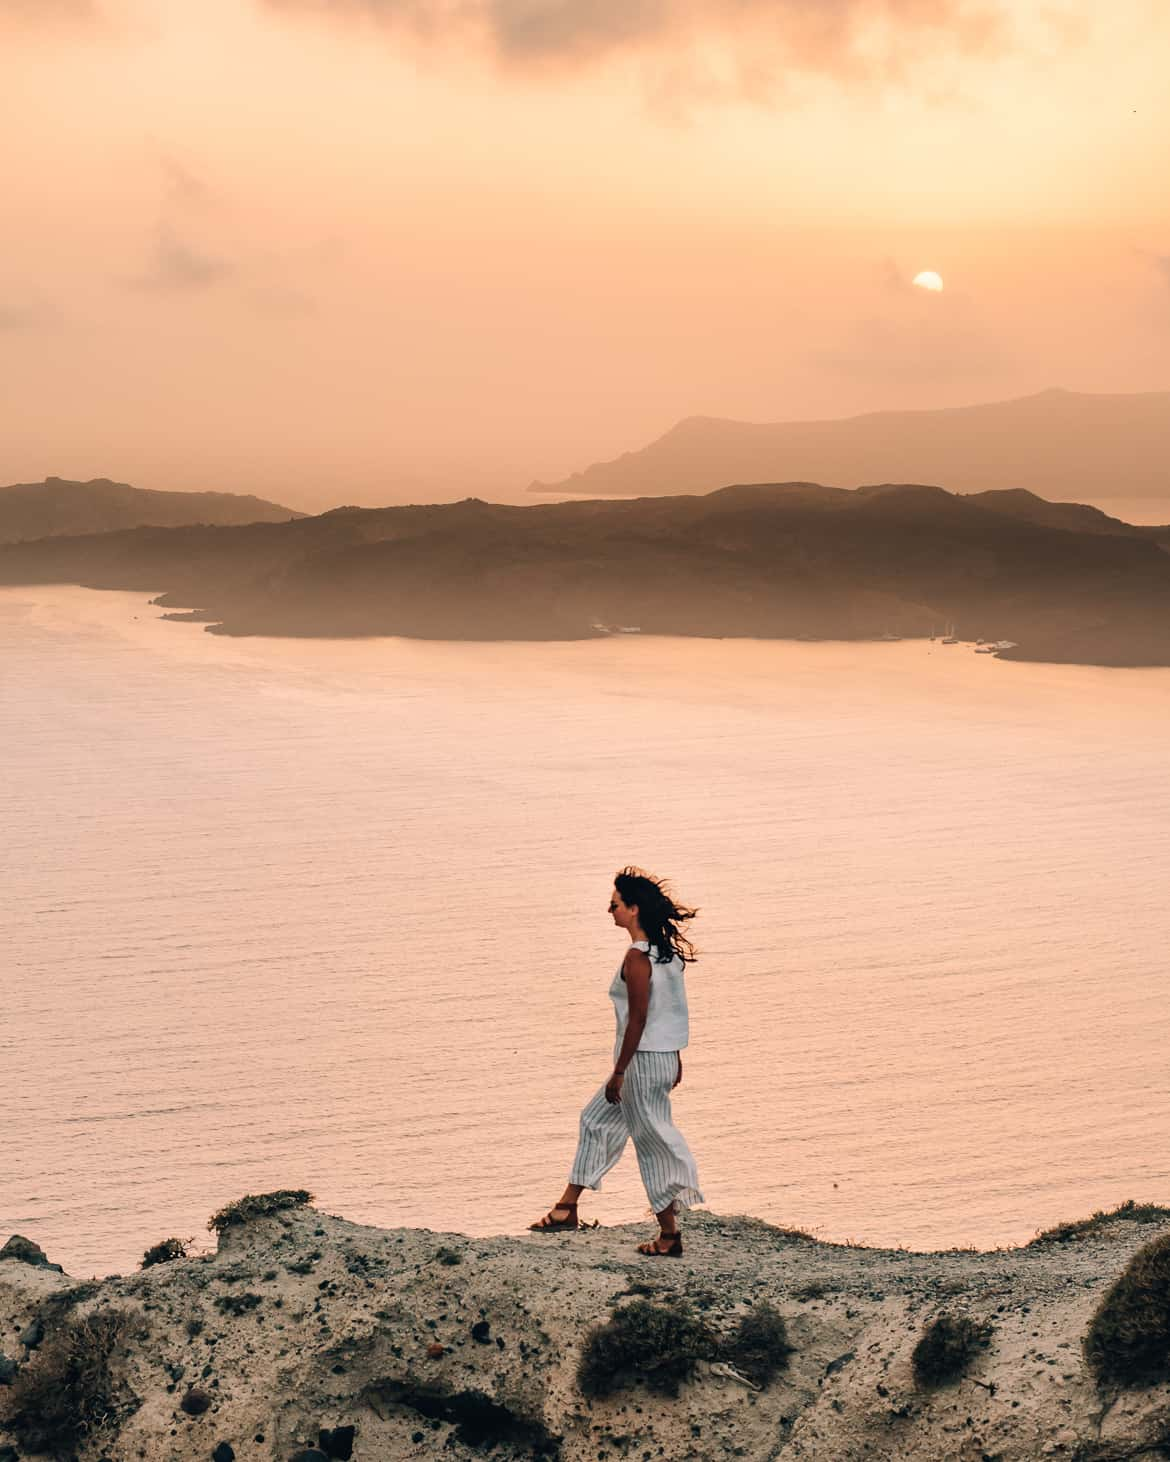 Santorini Travel Guide: Sonnenuntergang in Fira